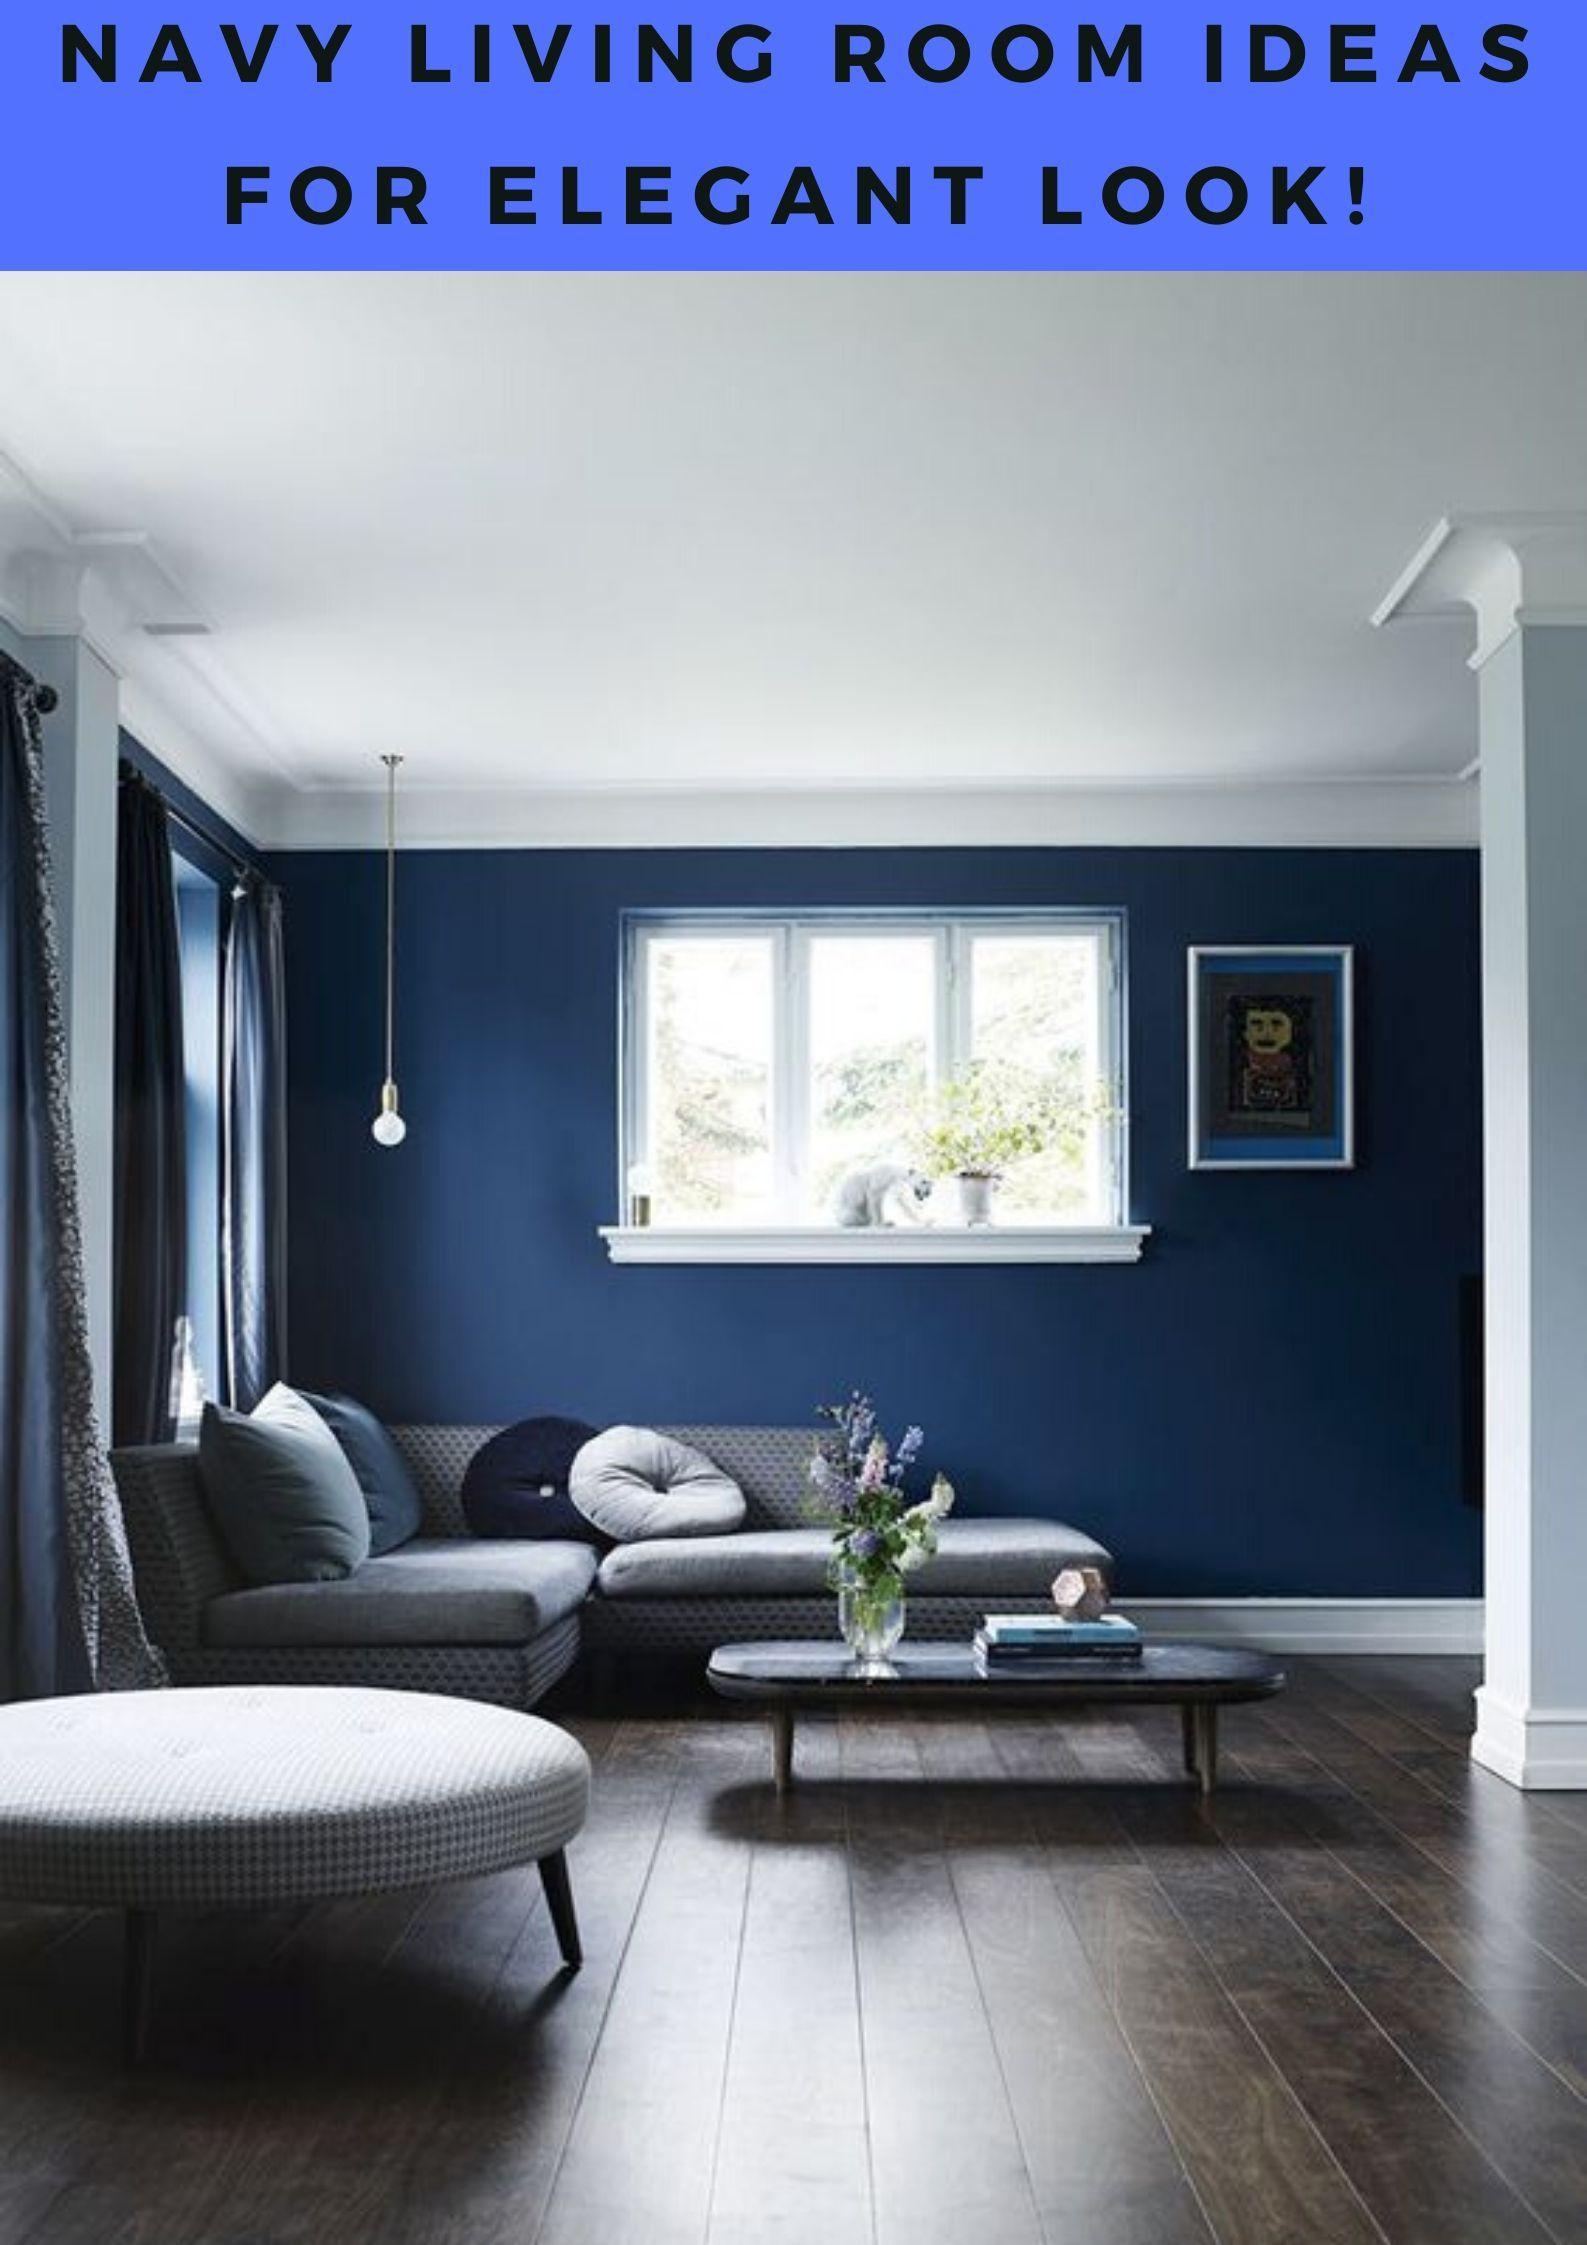 Alluring Navy Living Room Ideas That Will Stun You Navy Living Rooms Blue Walls Living Room Blue Living Room